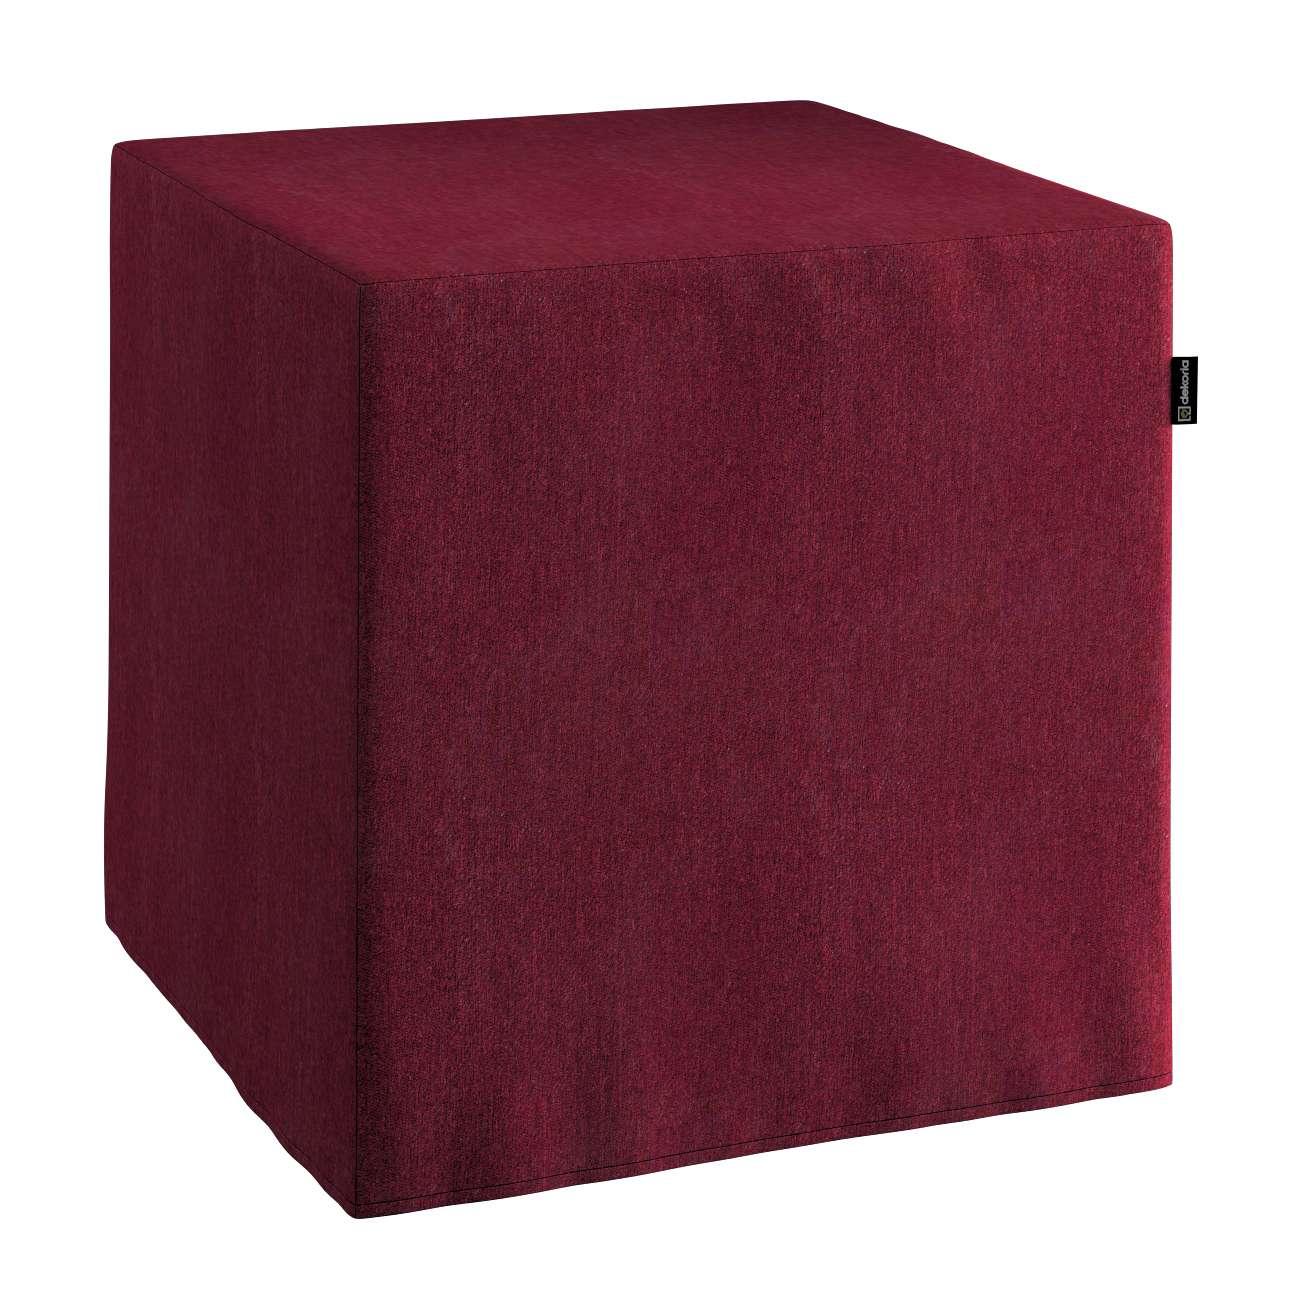 Sedák kostka - pevná 40 x 40 x 40 cm v kolekci Chenille , látka: 702-19